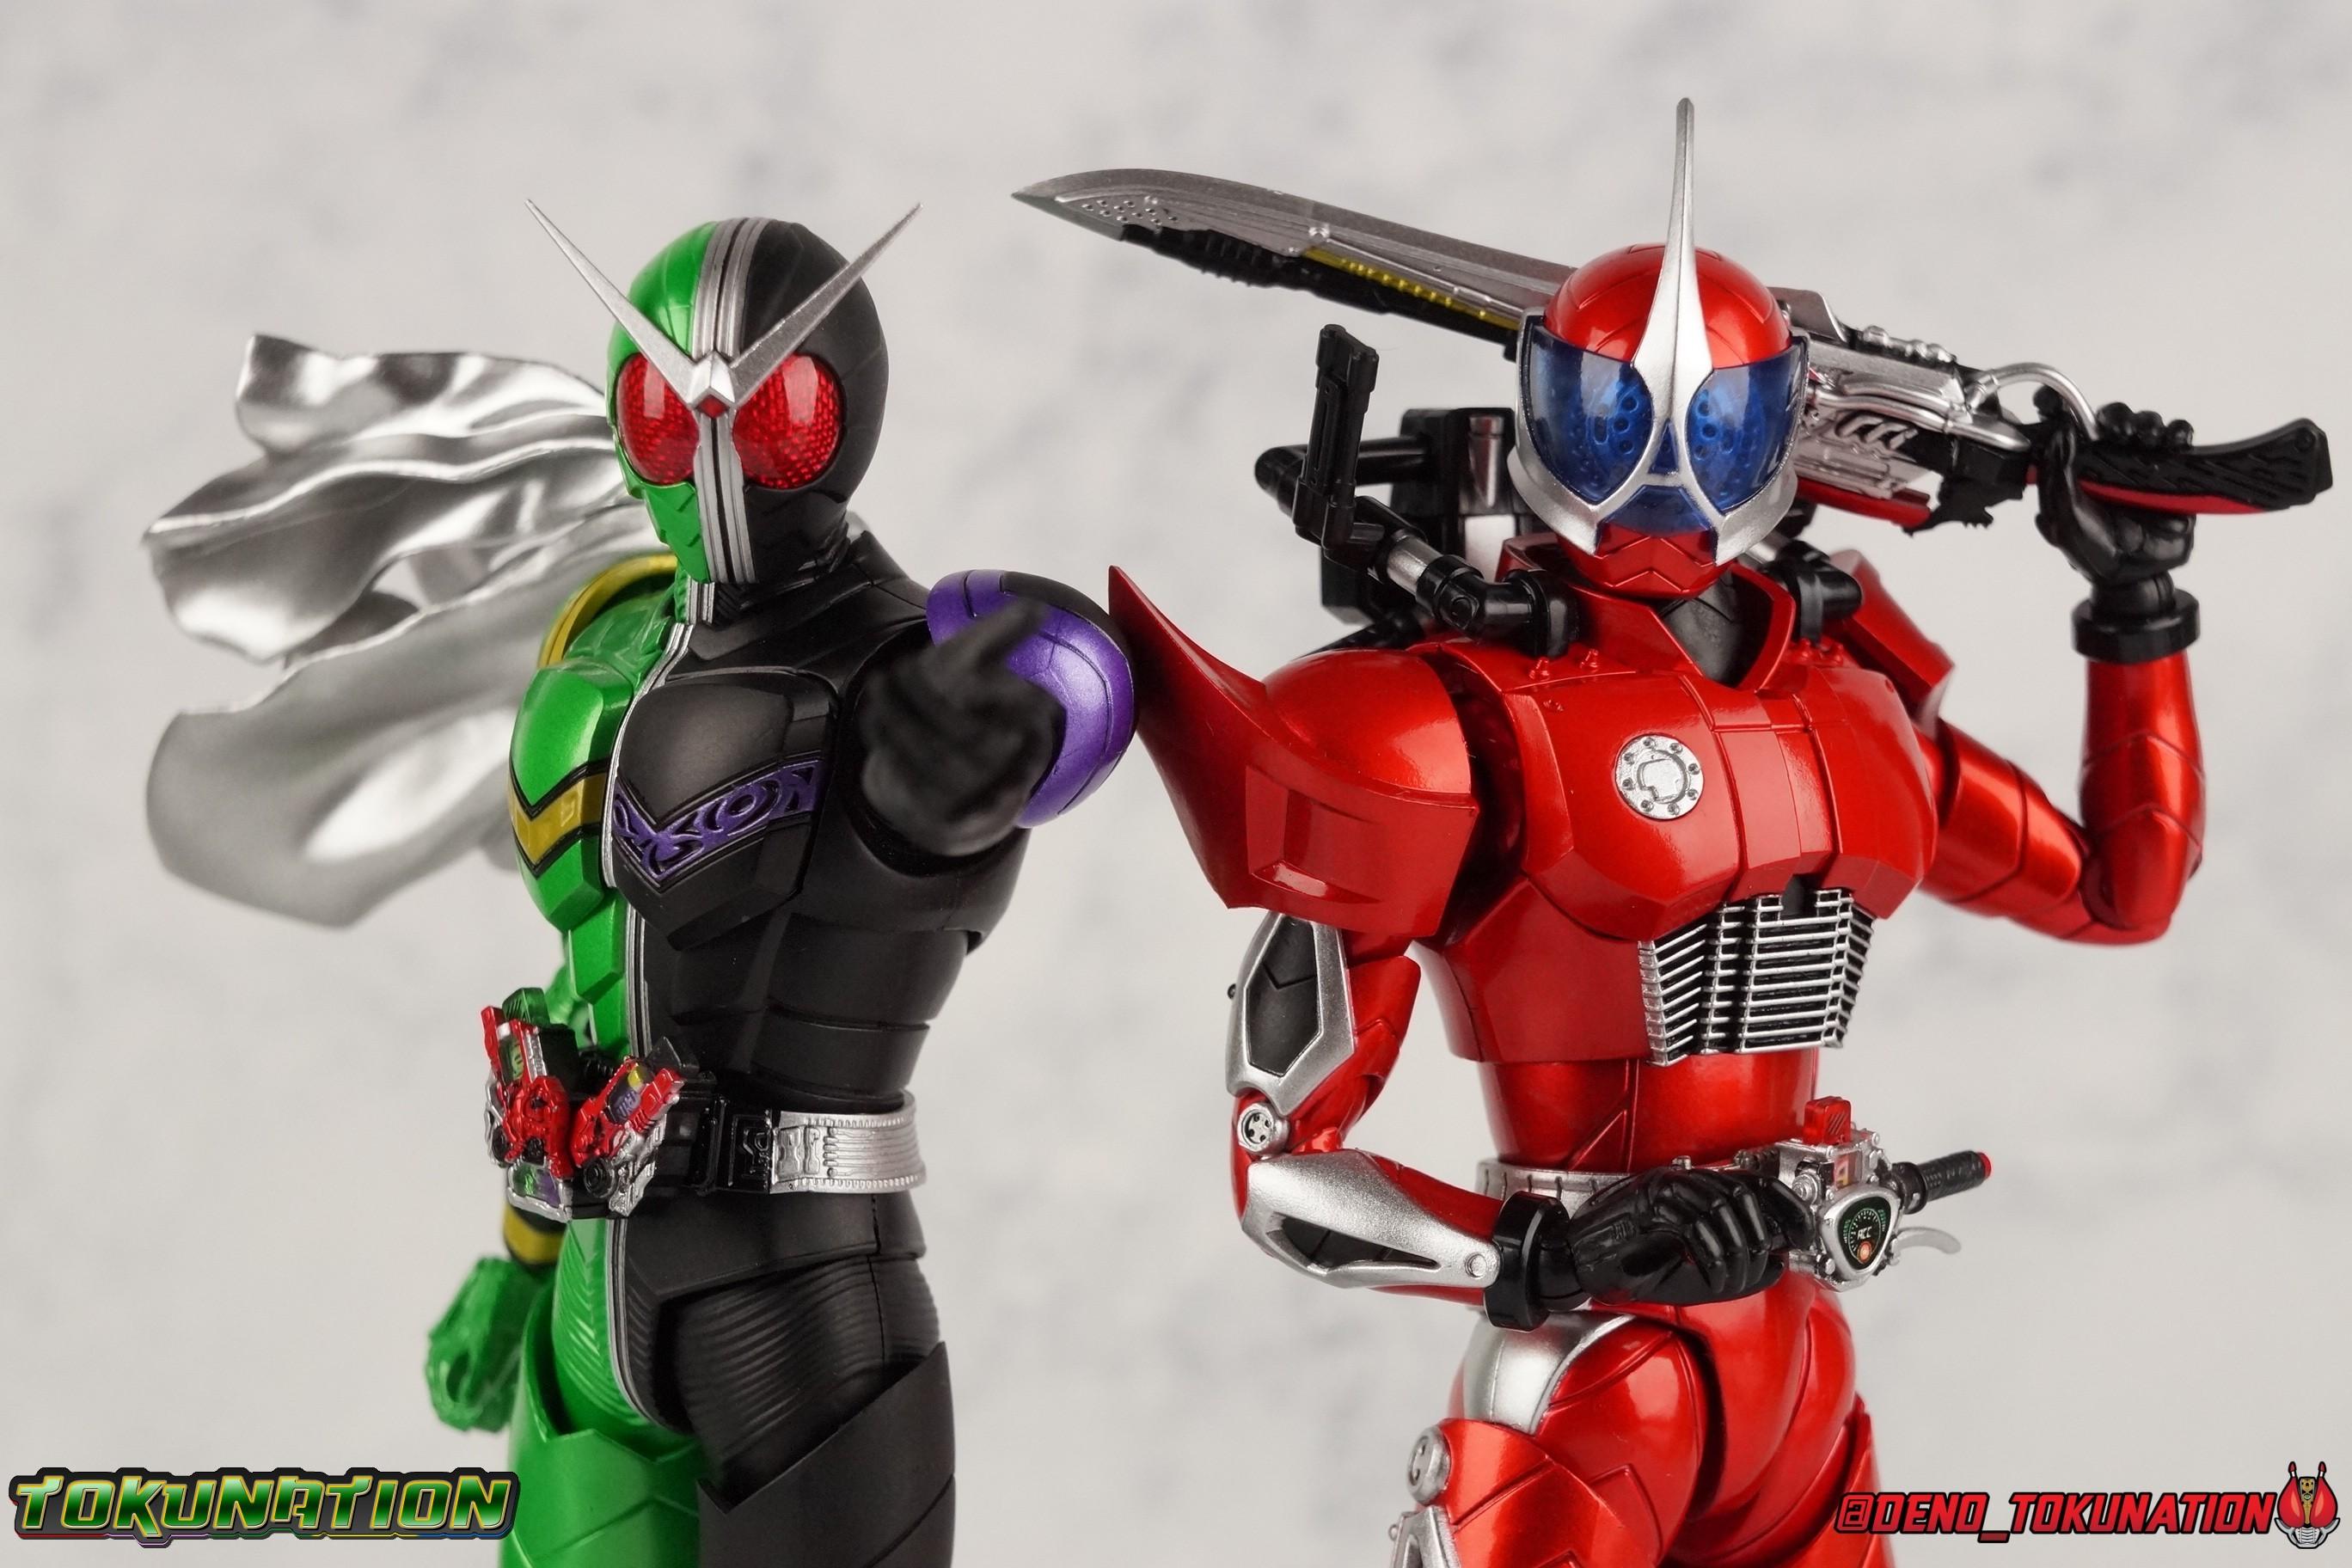 S.H. Figuarts Shinkocchou Seihou Kamen Rider Accel Gallery